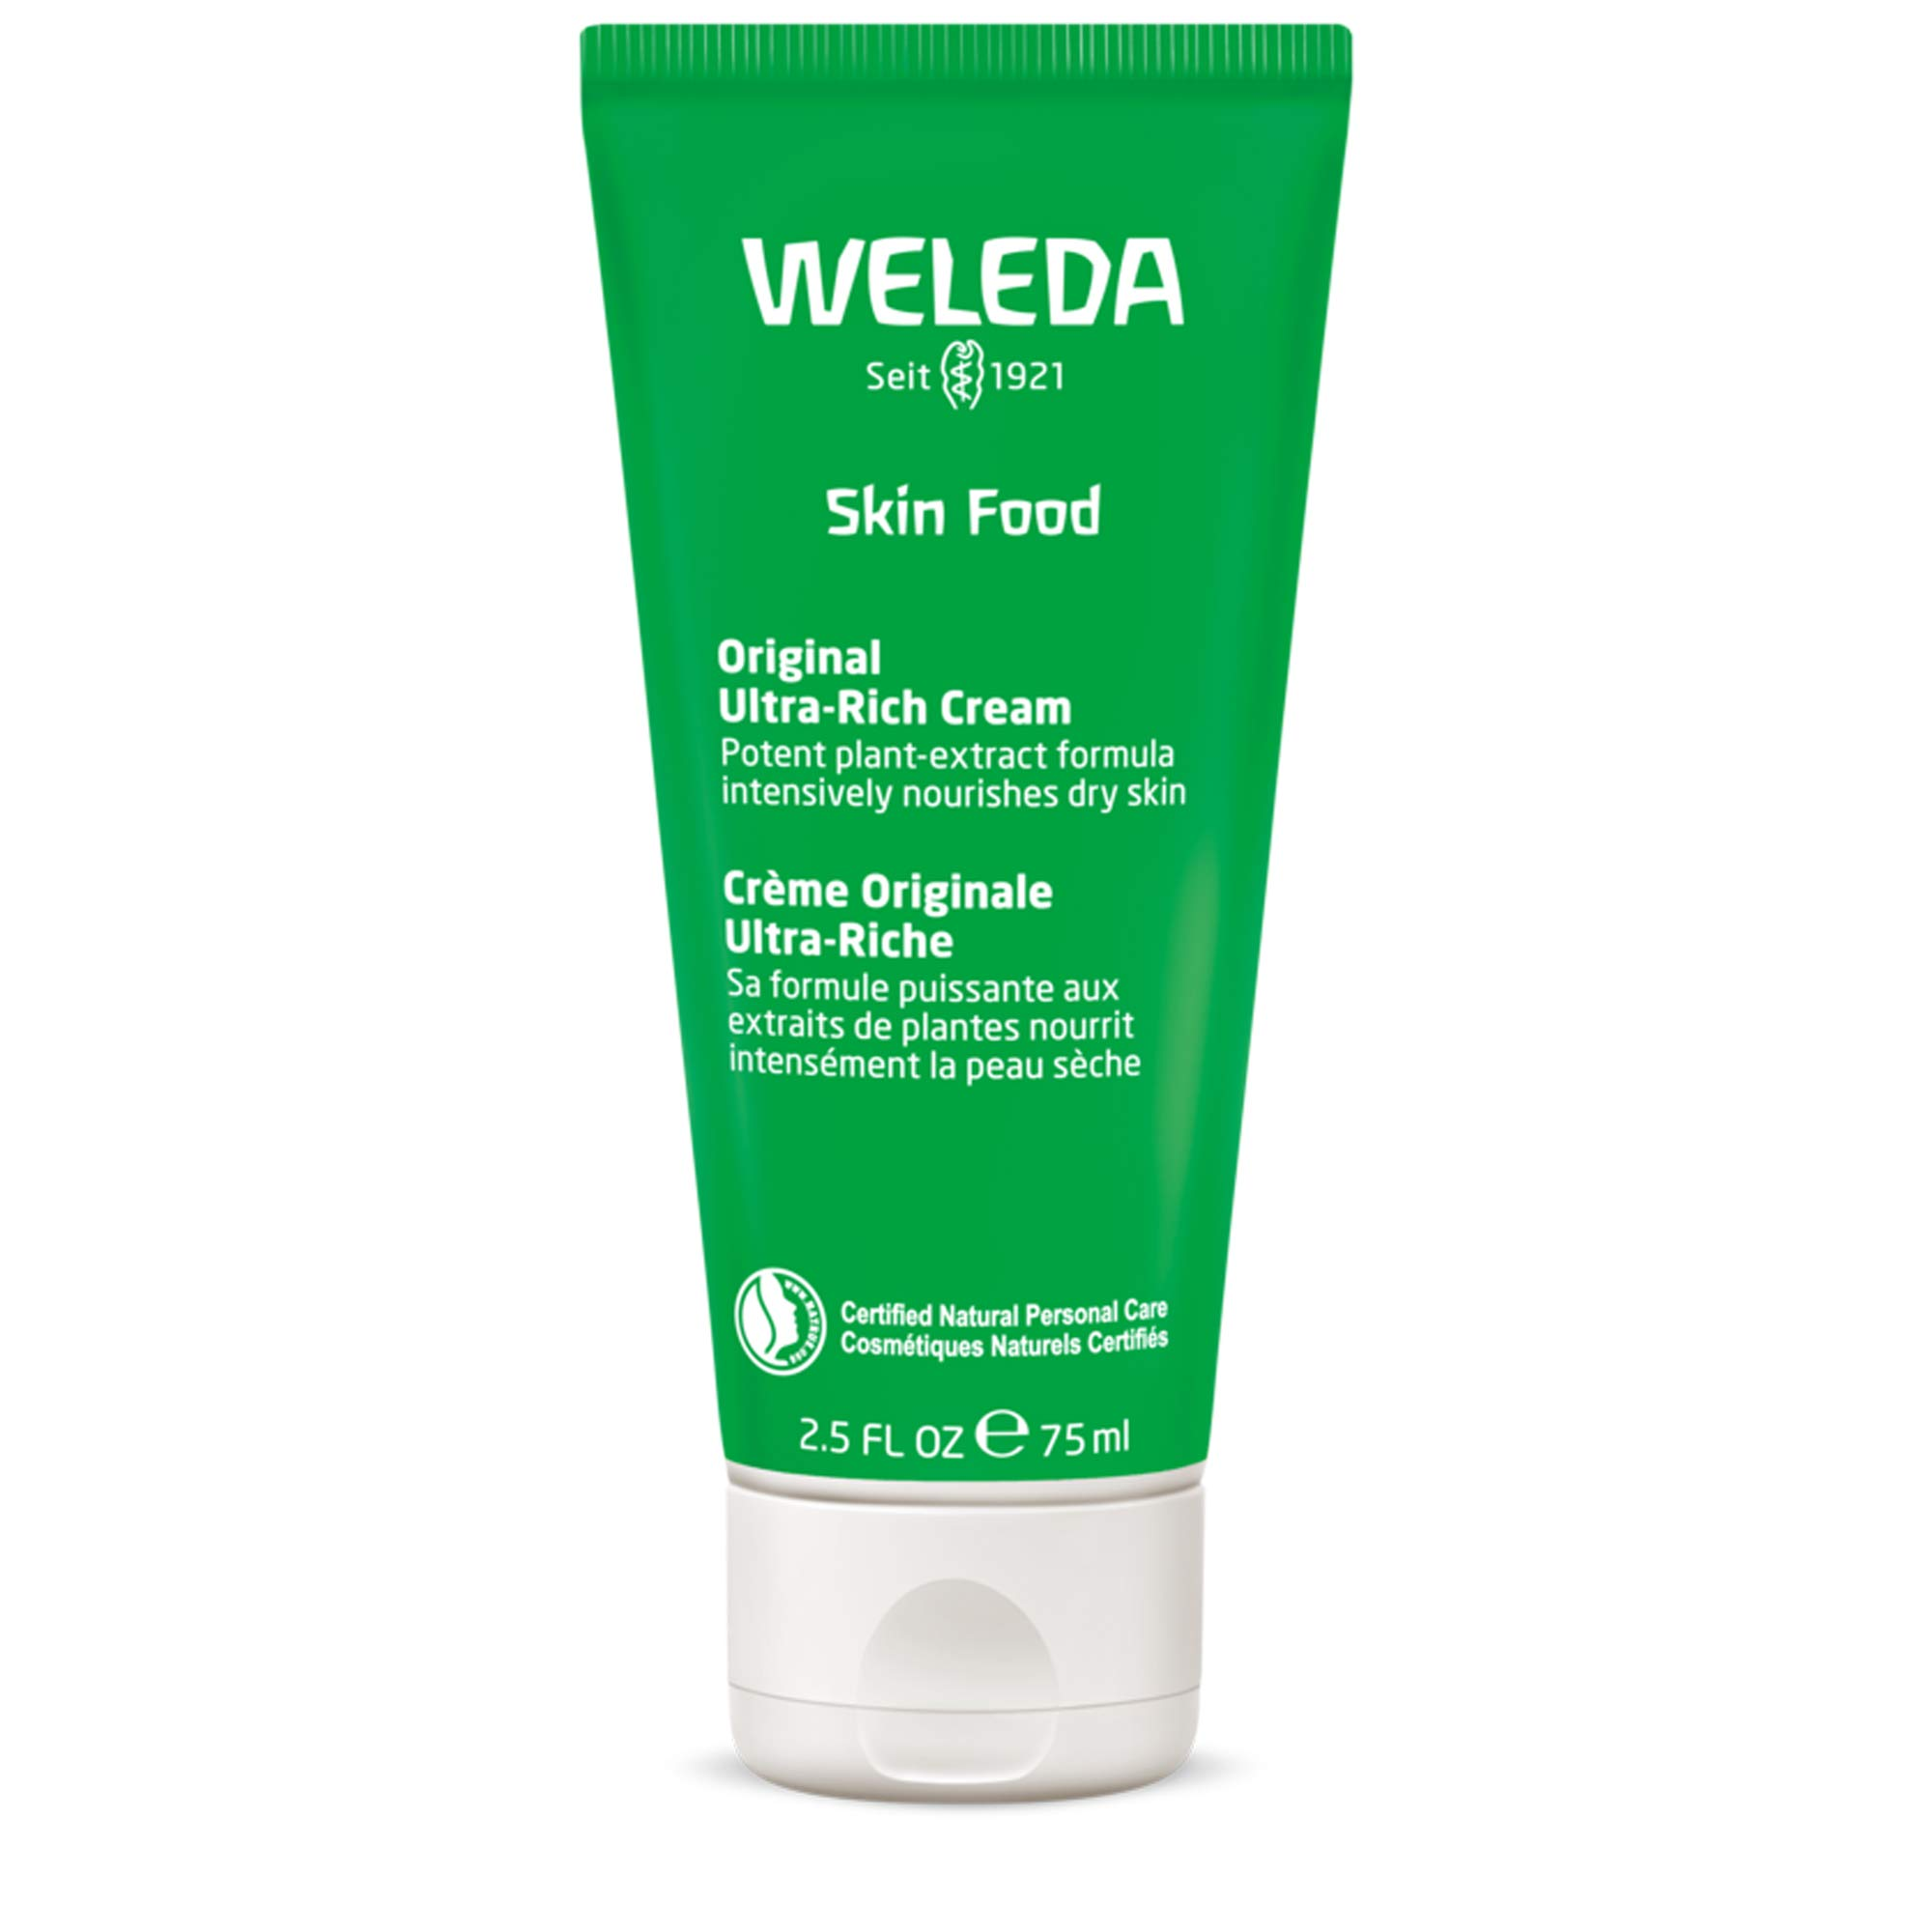 Weleda Skin Food, 2.5 Ounce by Weleda